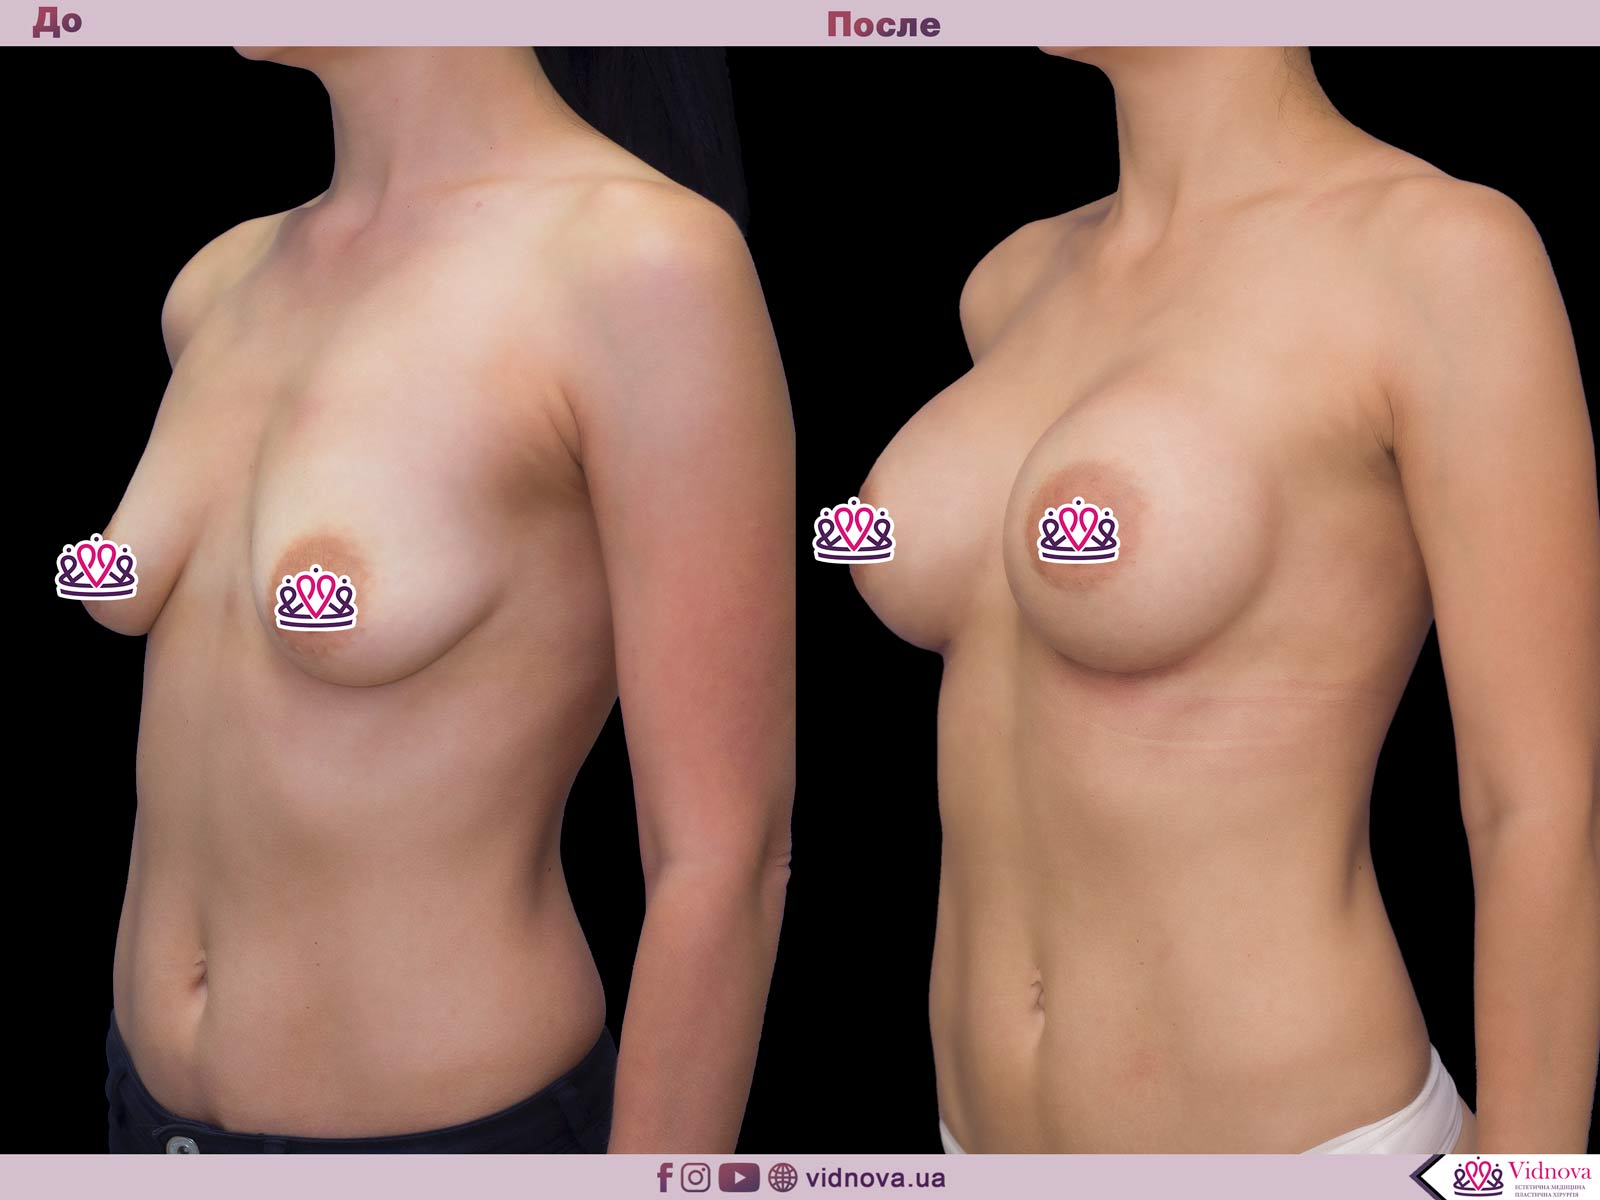 Увеличение груди: Фото ДО и ПОСЛЕ - Пример №53-2 - Клиника Vidnova